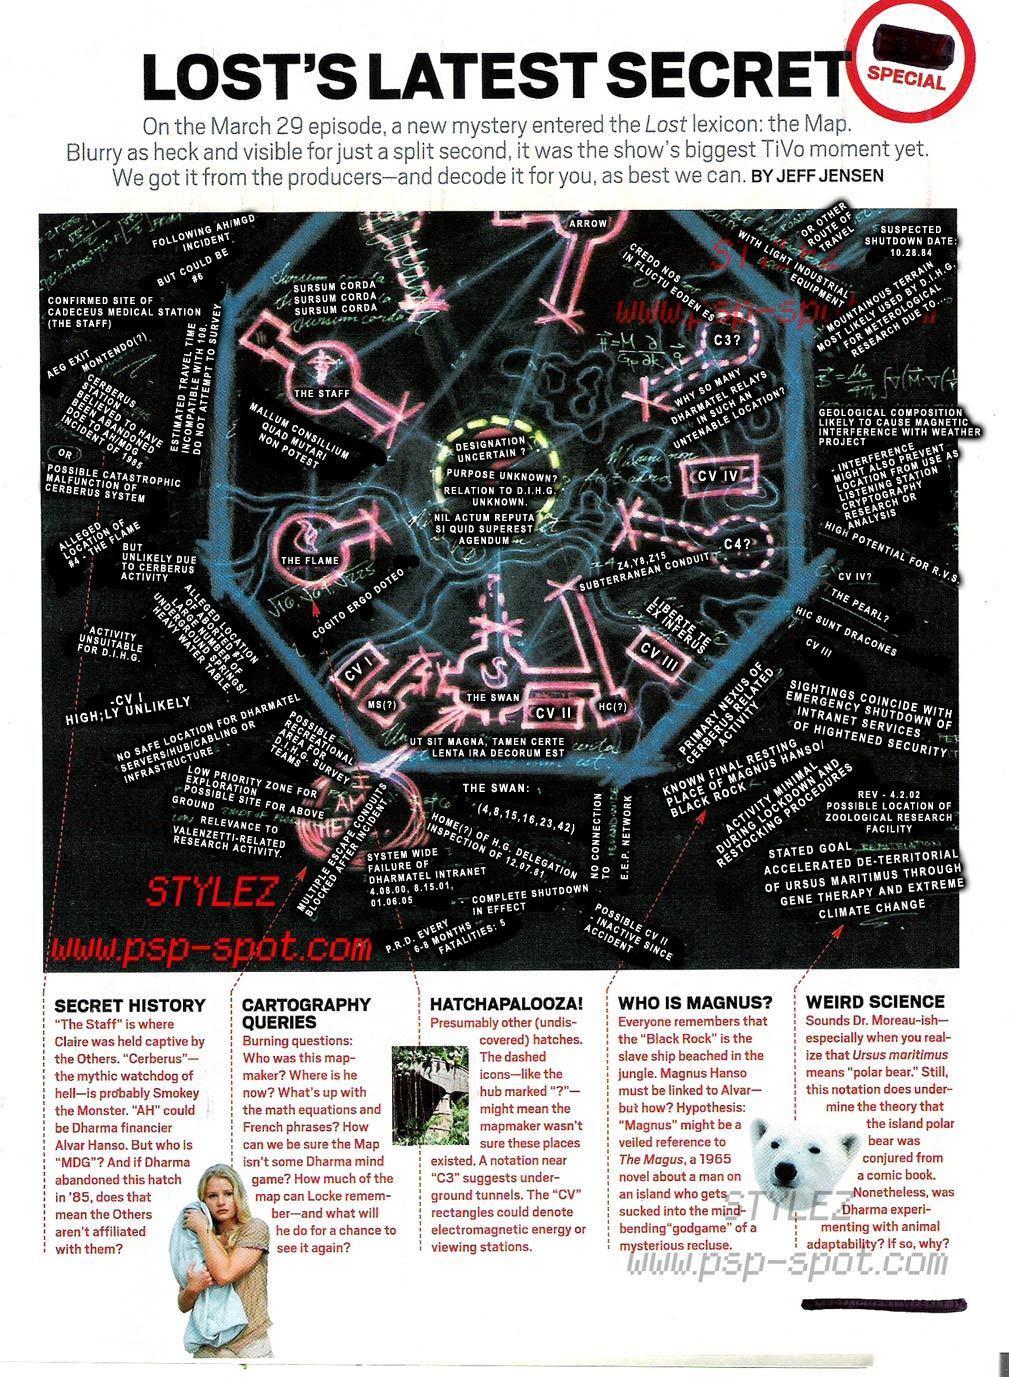 Blast Map - jirufeke76.over-blog.com